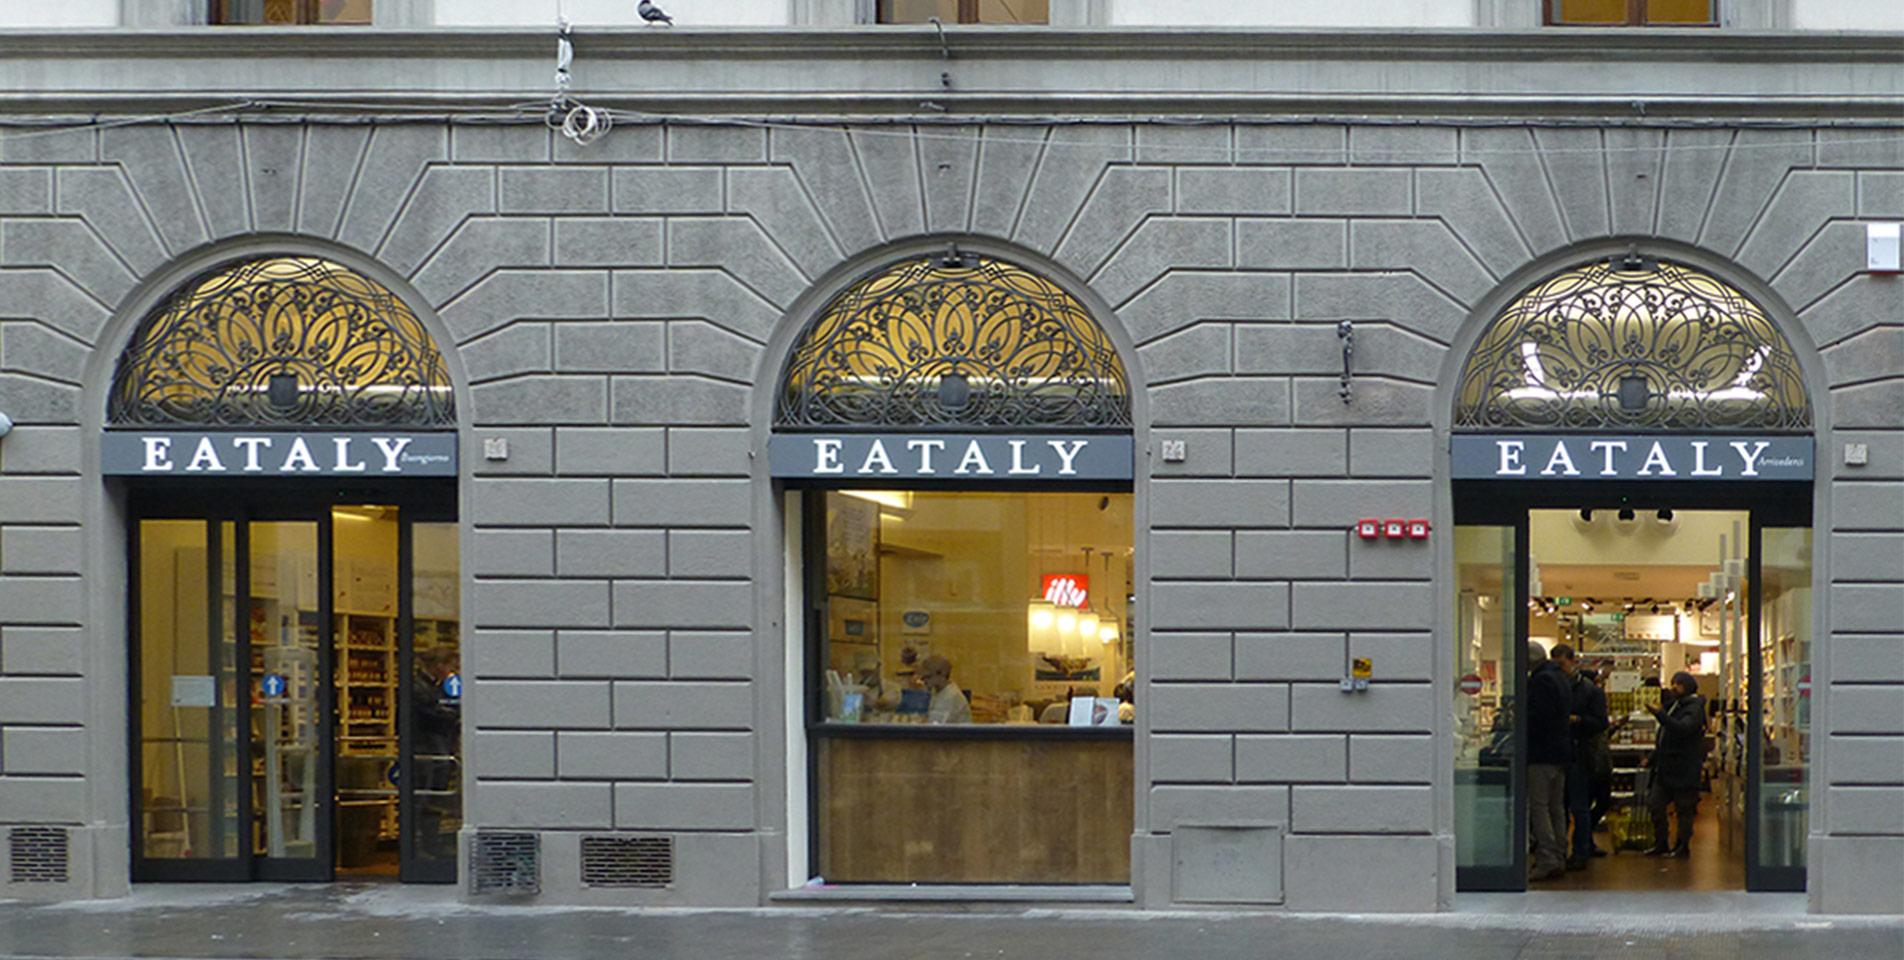 Eataly con i suoi corsi di cucina ed educazione alimentare per bambini a firenze - Eataly corsi cucina ...